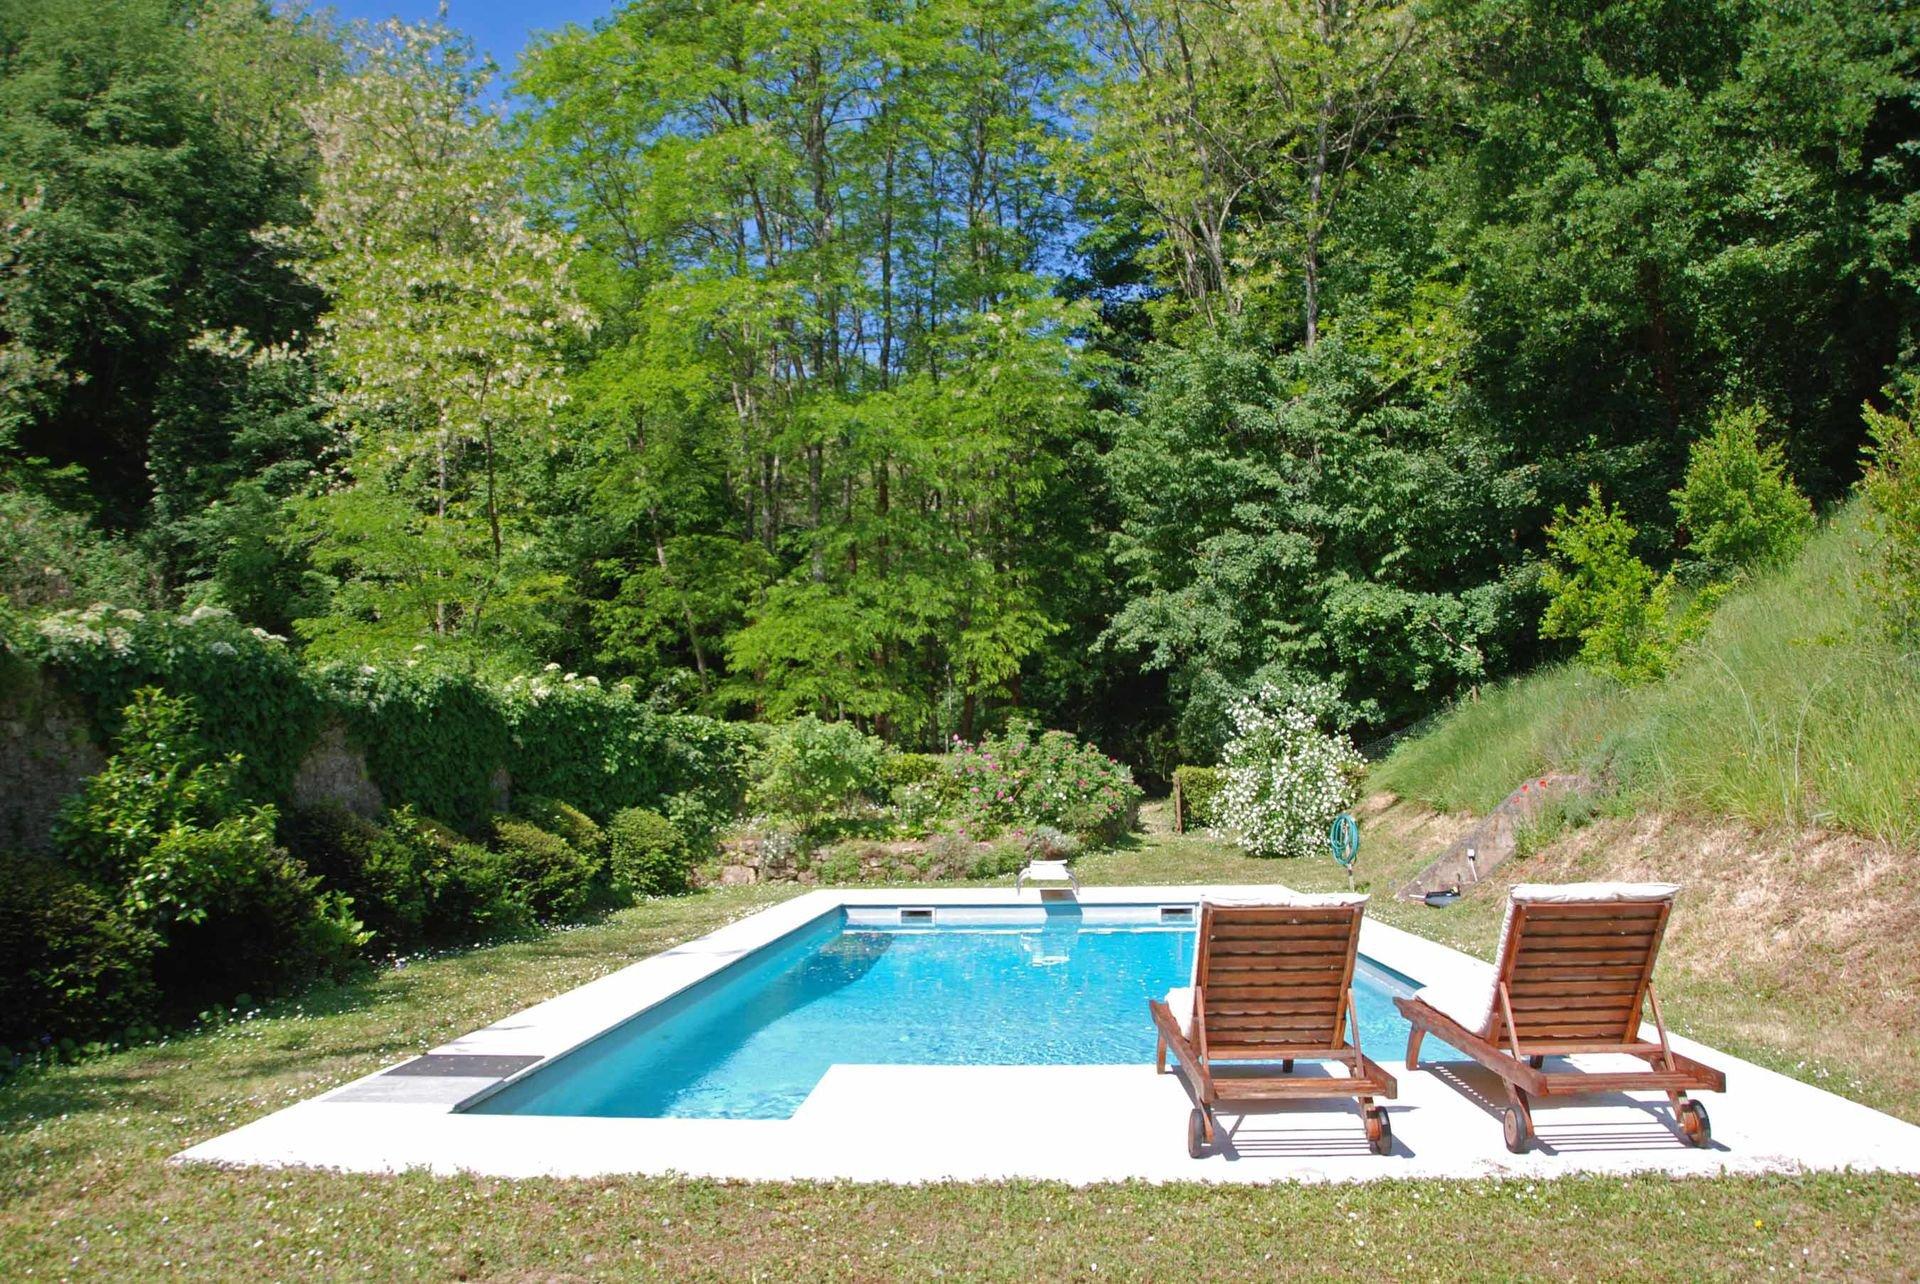 Location saisonnière Villa - San Gimignano - Italie